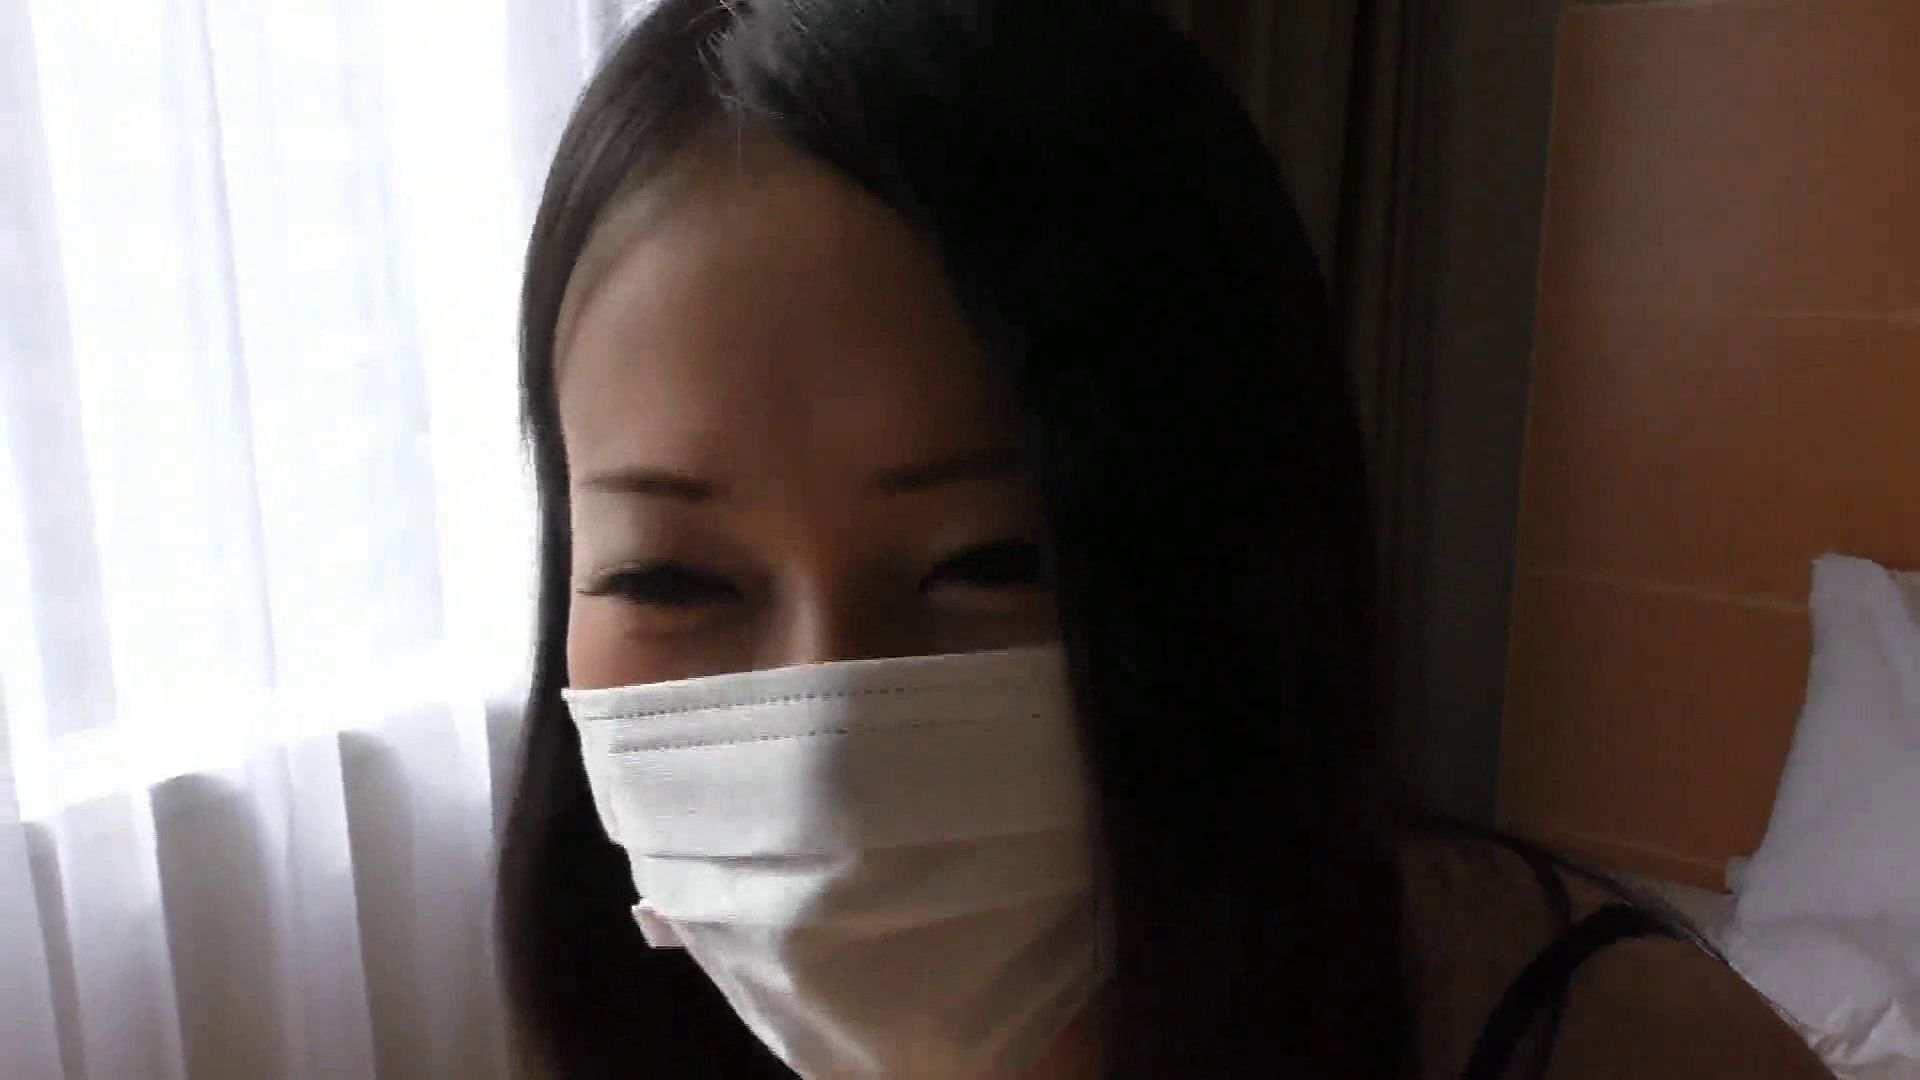 S級厳選美女ビッチガールVol.22 美女ヌード天国 ぱこり動画紹介 60PIX 14